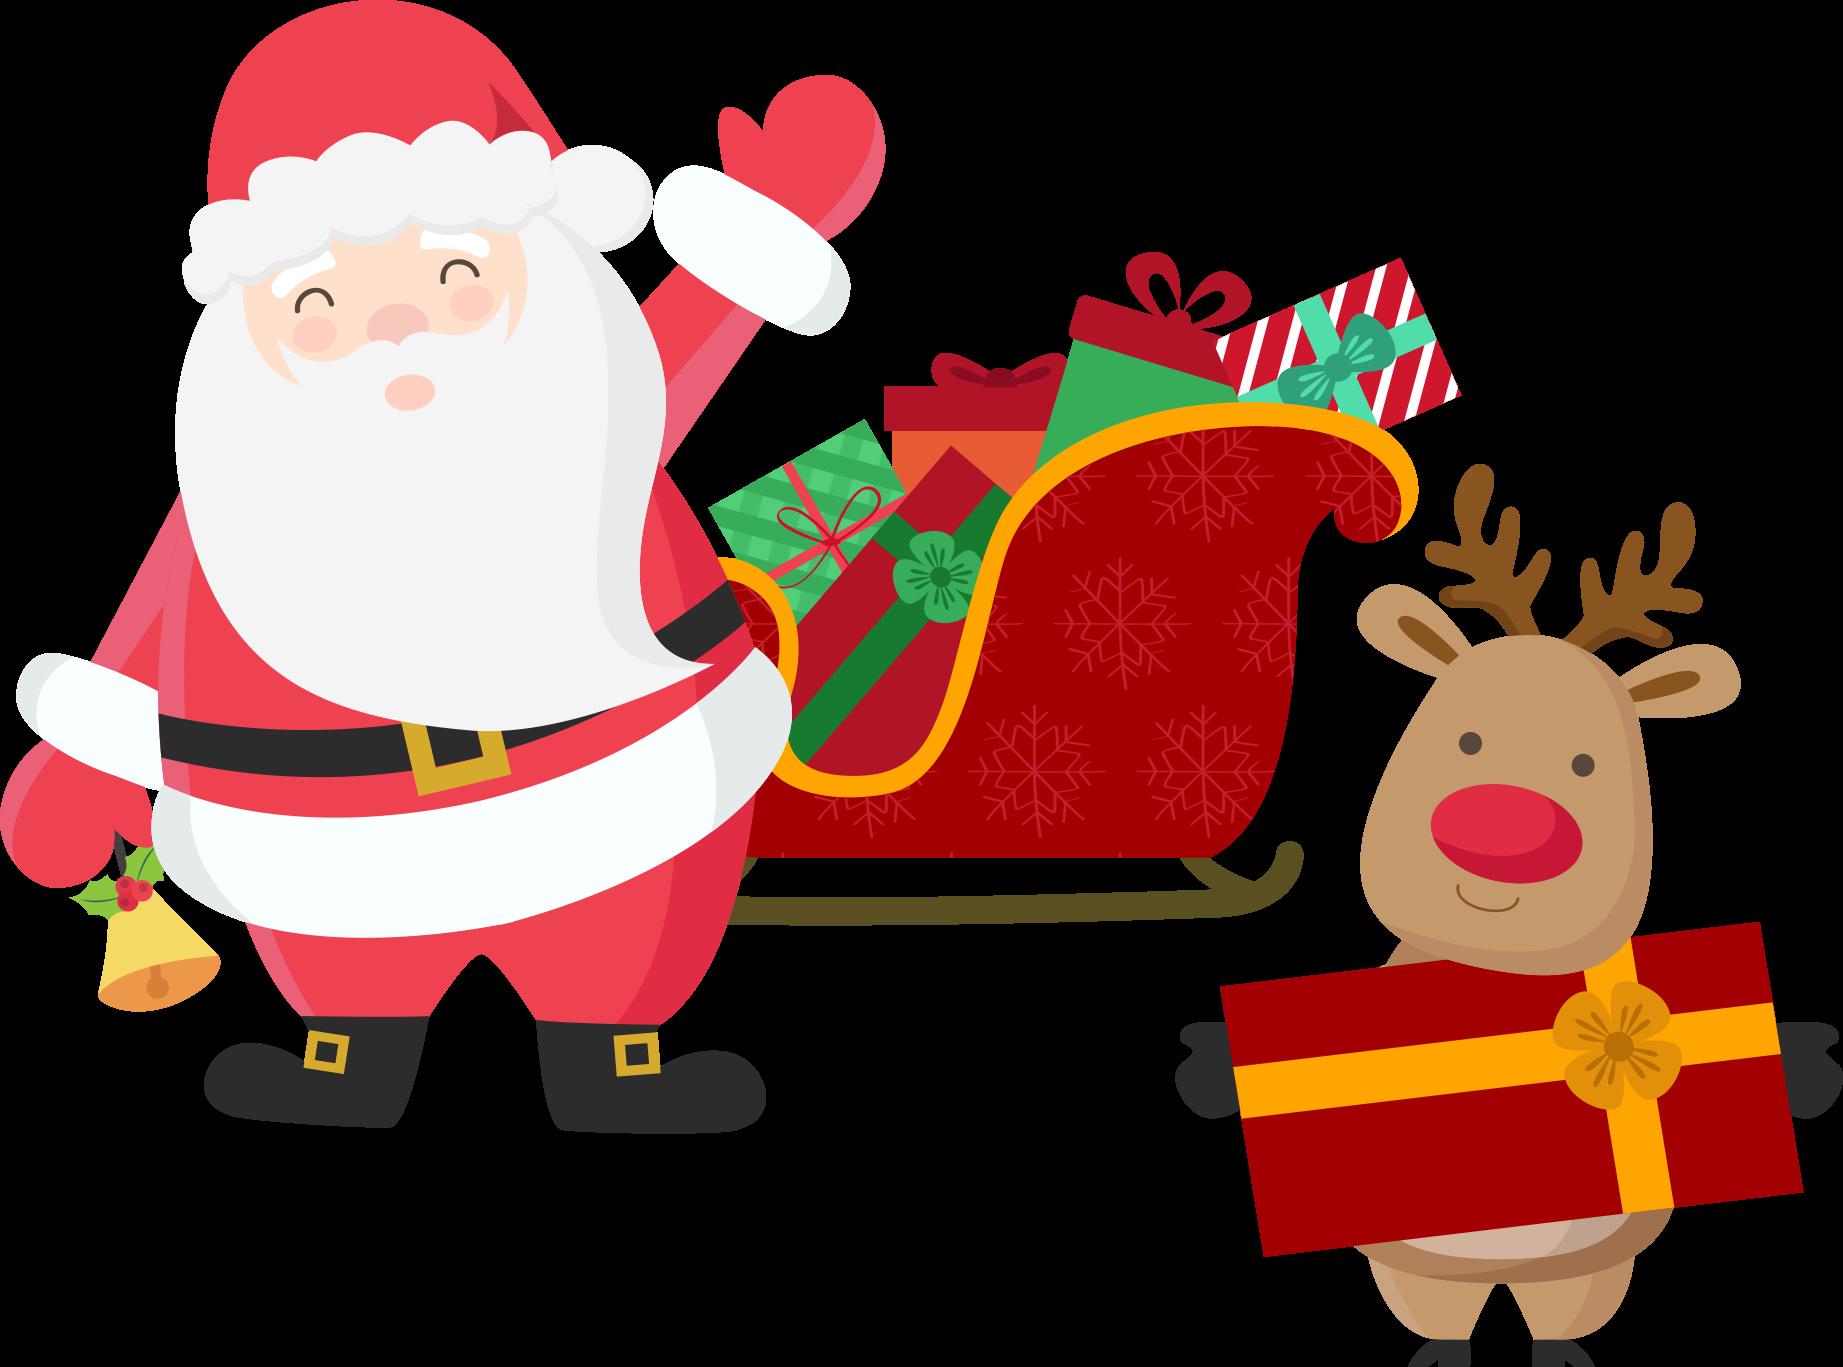 Santa in slegh mark your calander clipart jpg freeuse Download Elk Rudolph Claus Reindeer Claus\'S Santa Sleigh ... jpg freeuse